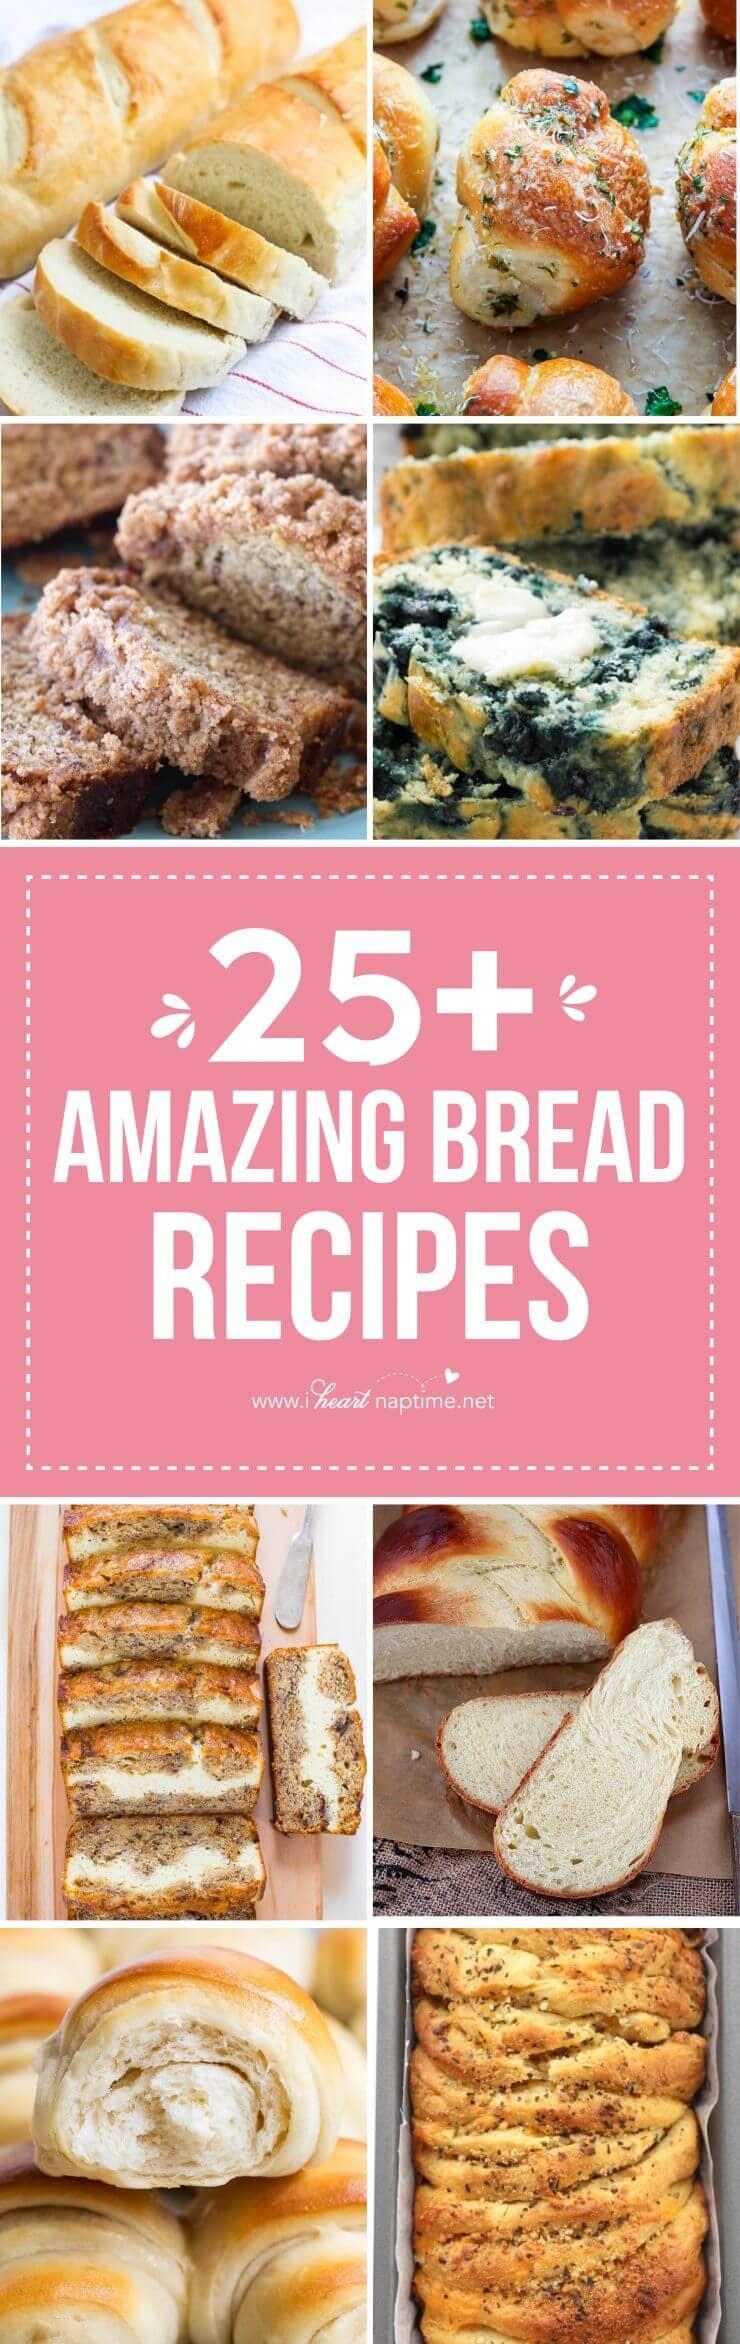 amazing bread recipes